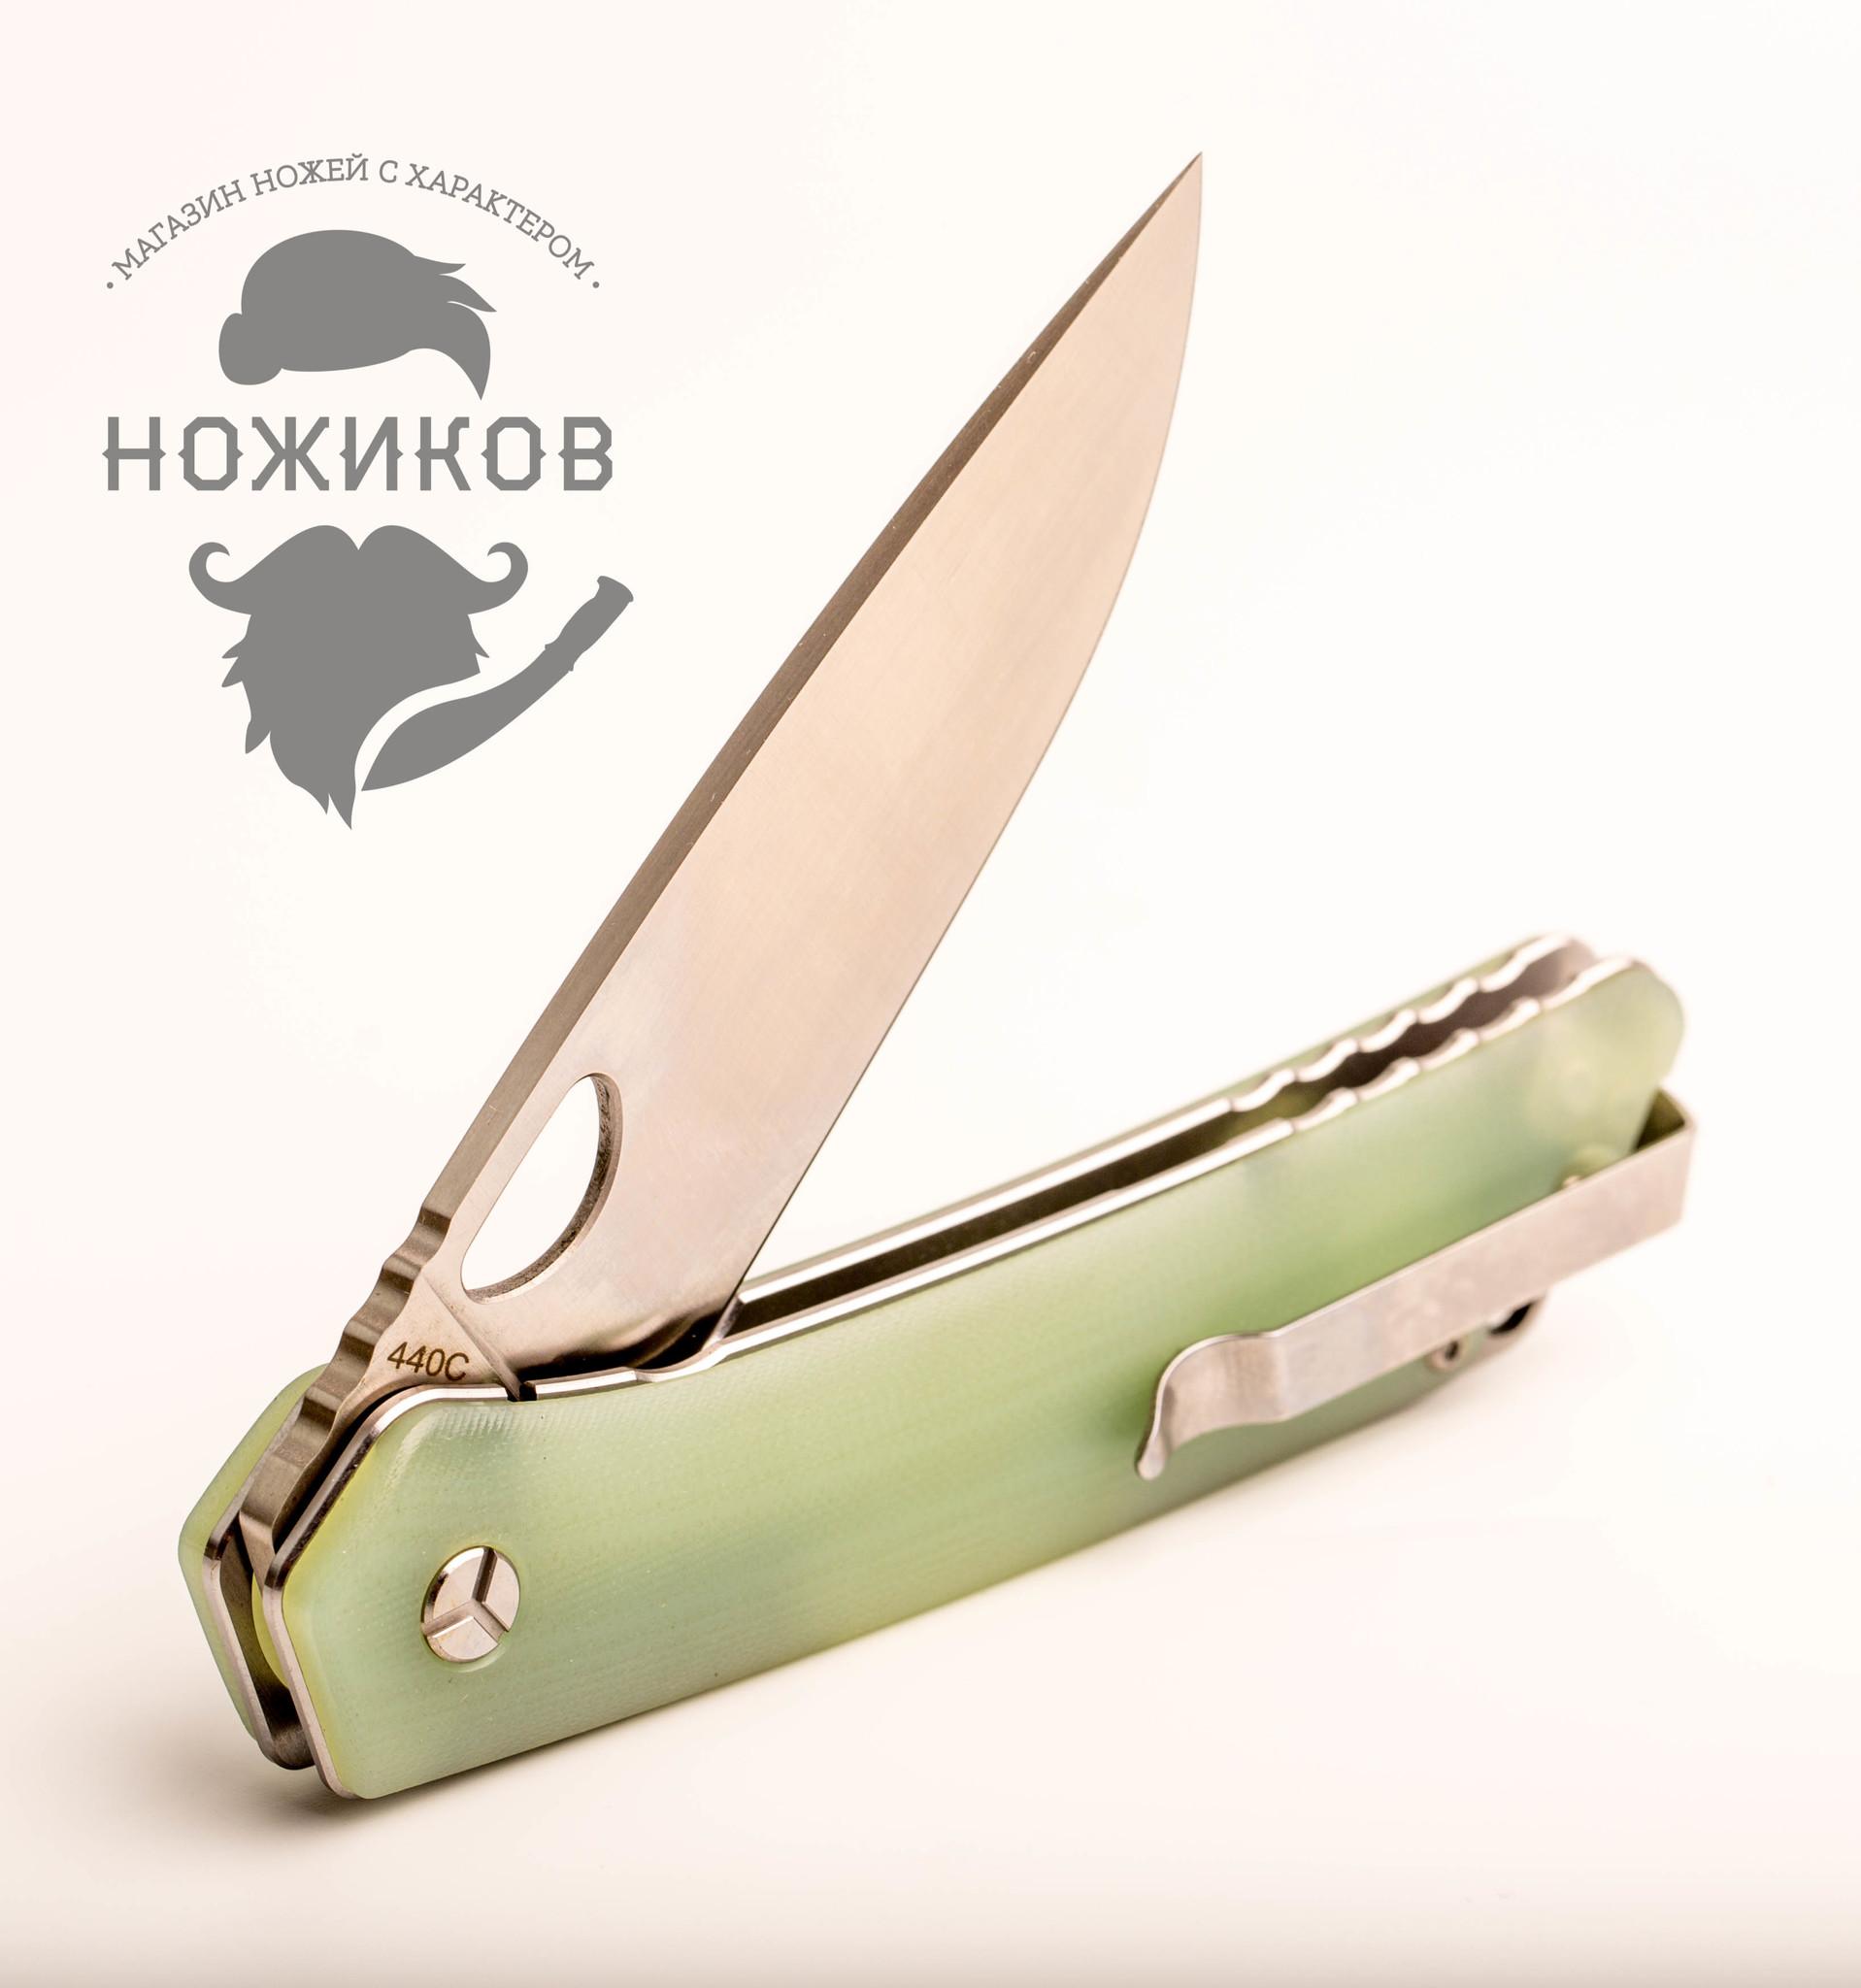 Фото 7 - Складной нож lk5016gr от Steelclaw